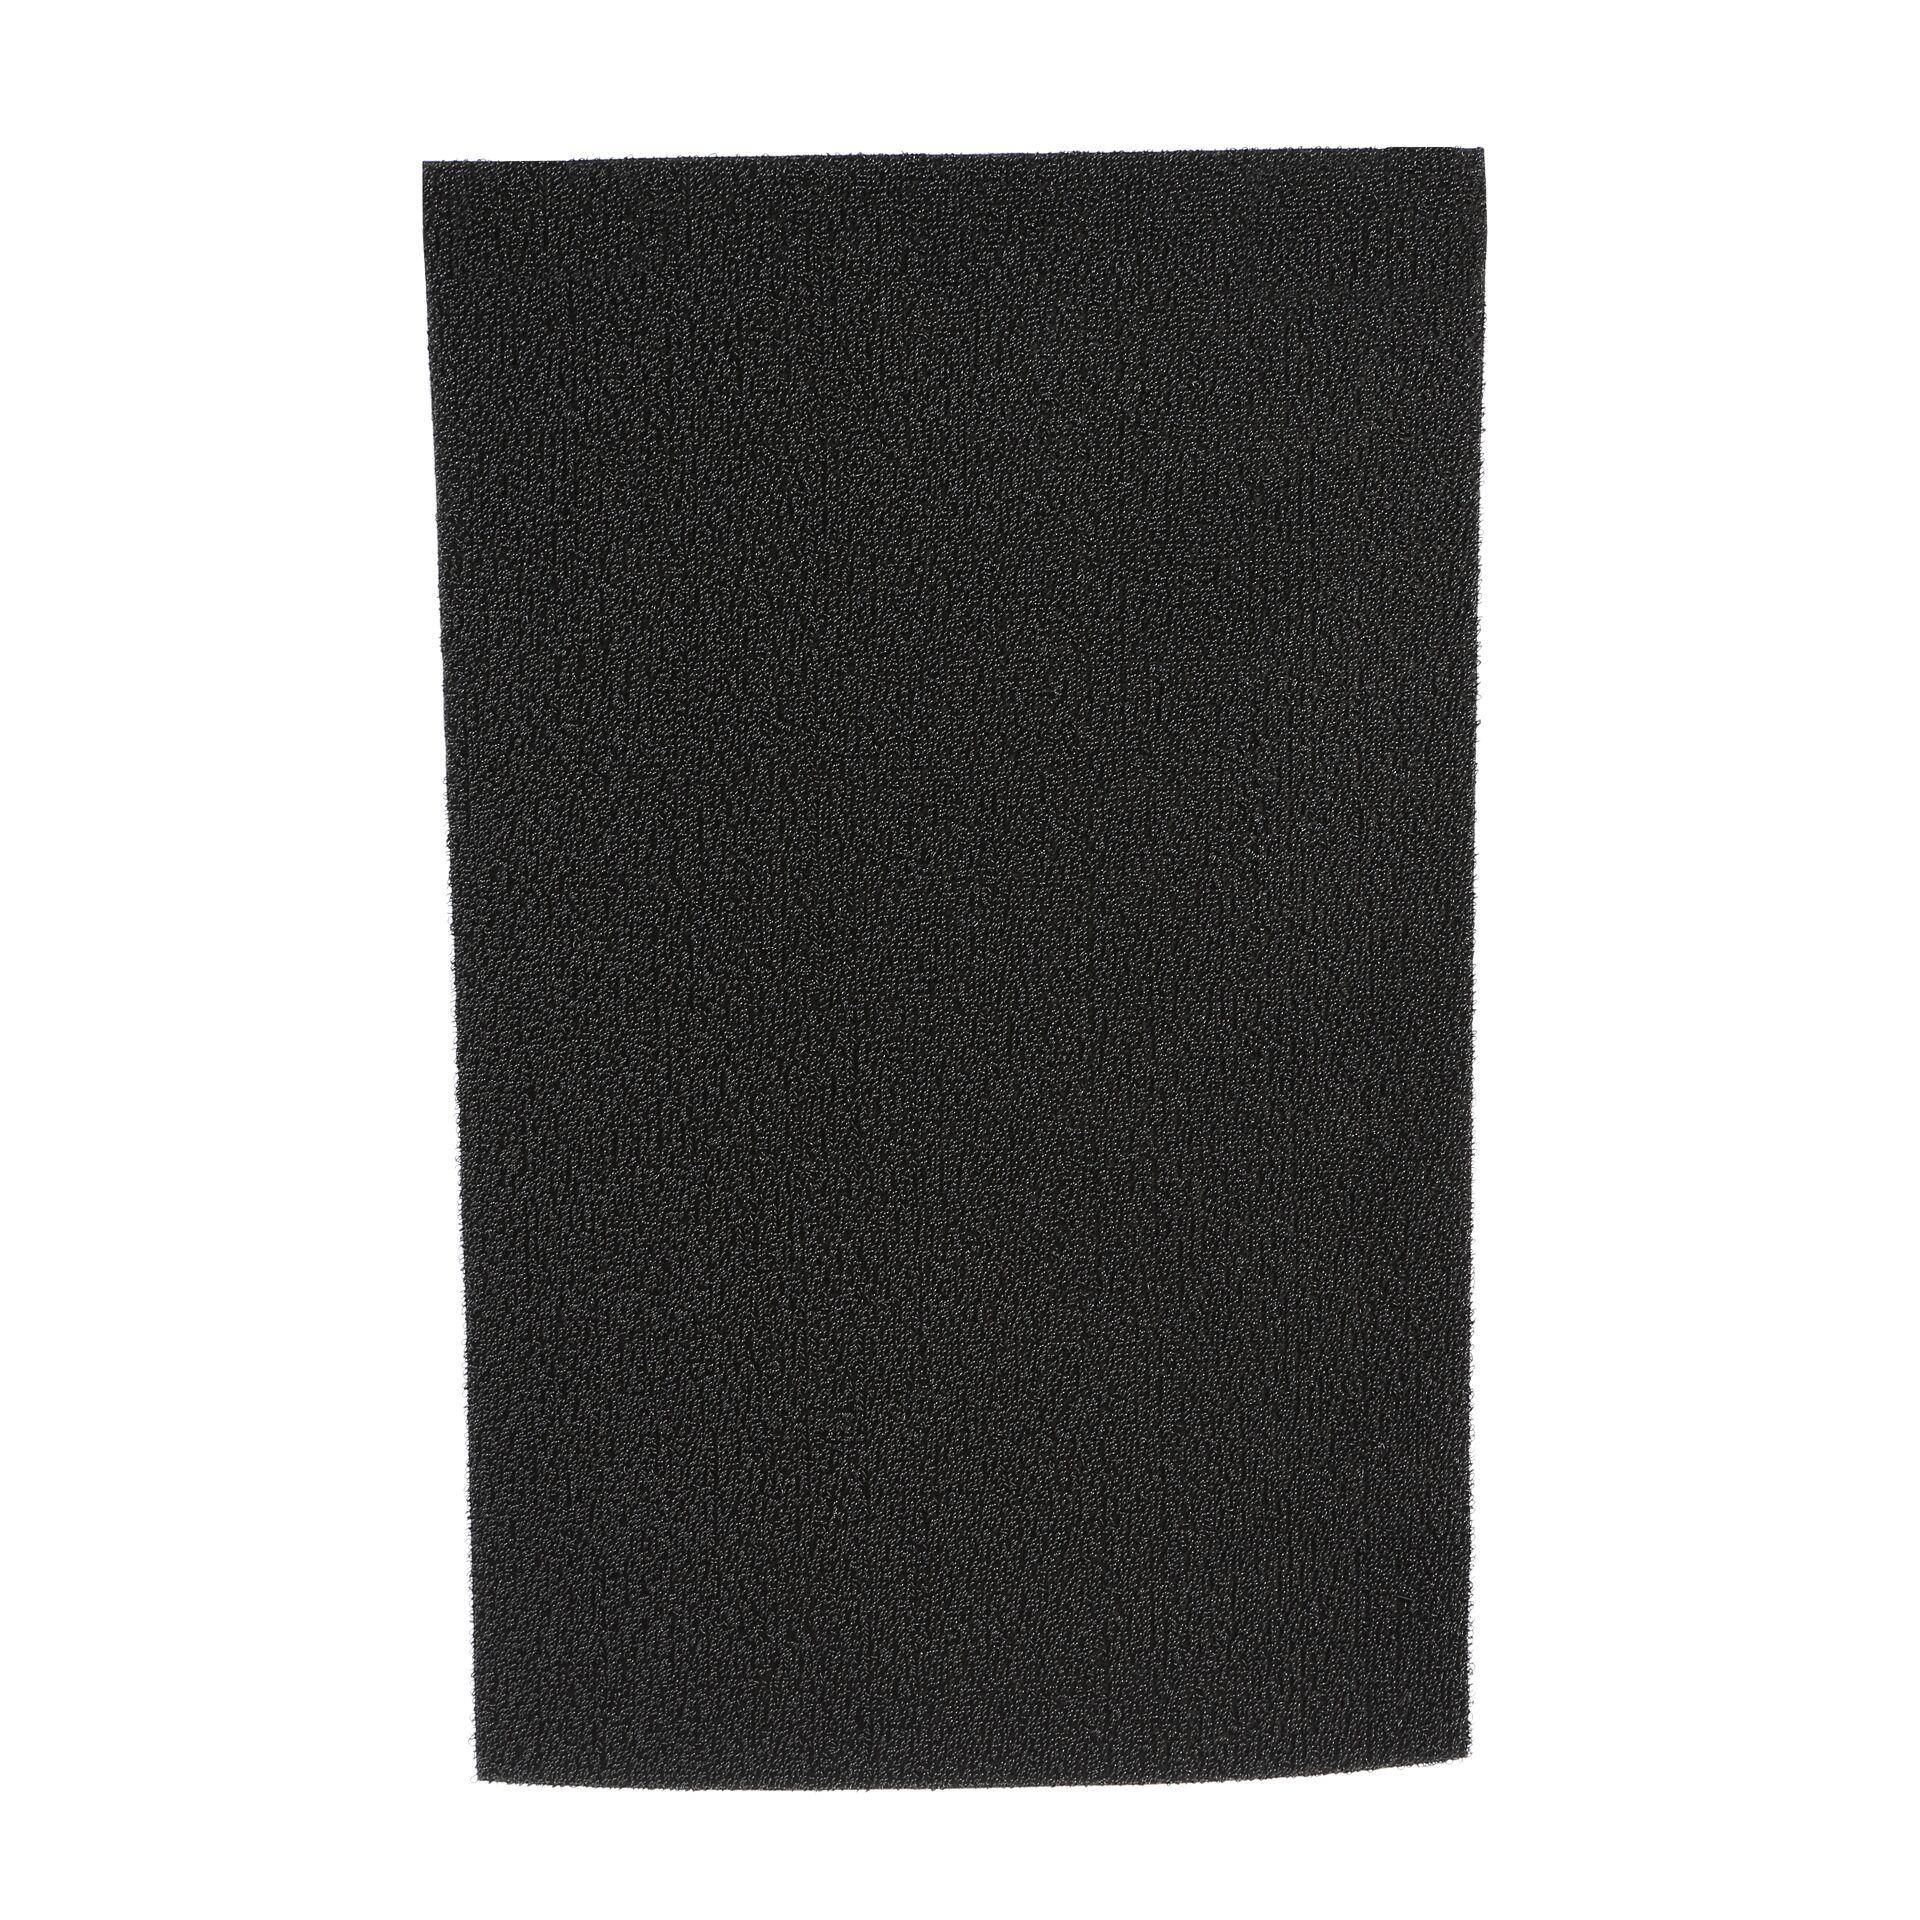 Shag Solid Doormat Color: Solid Black, Mat Size: Rectangle 24